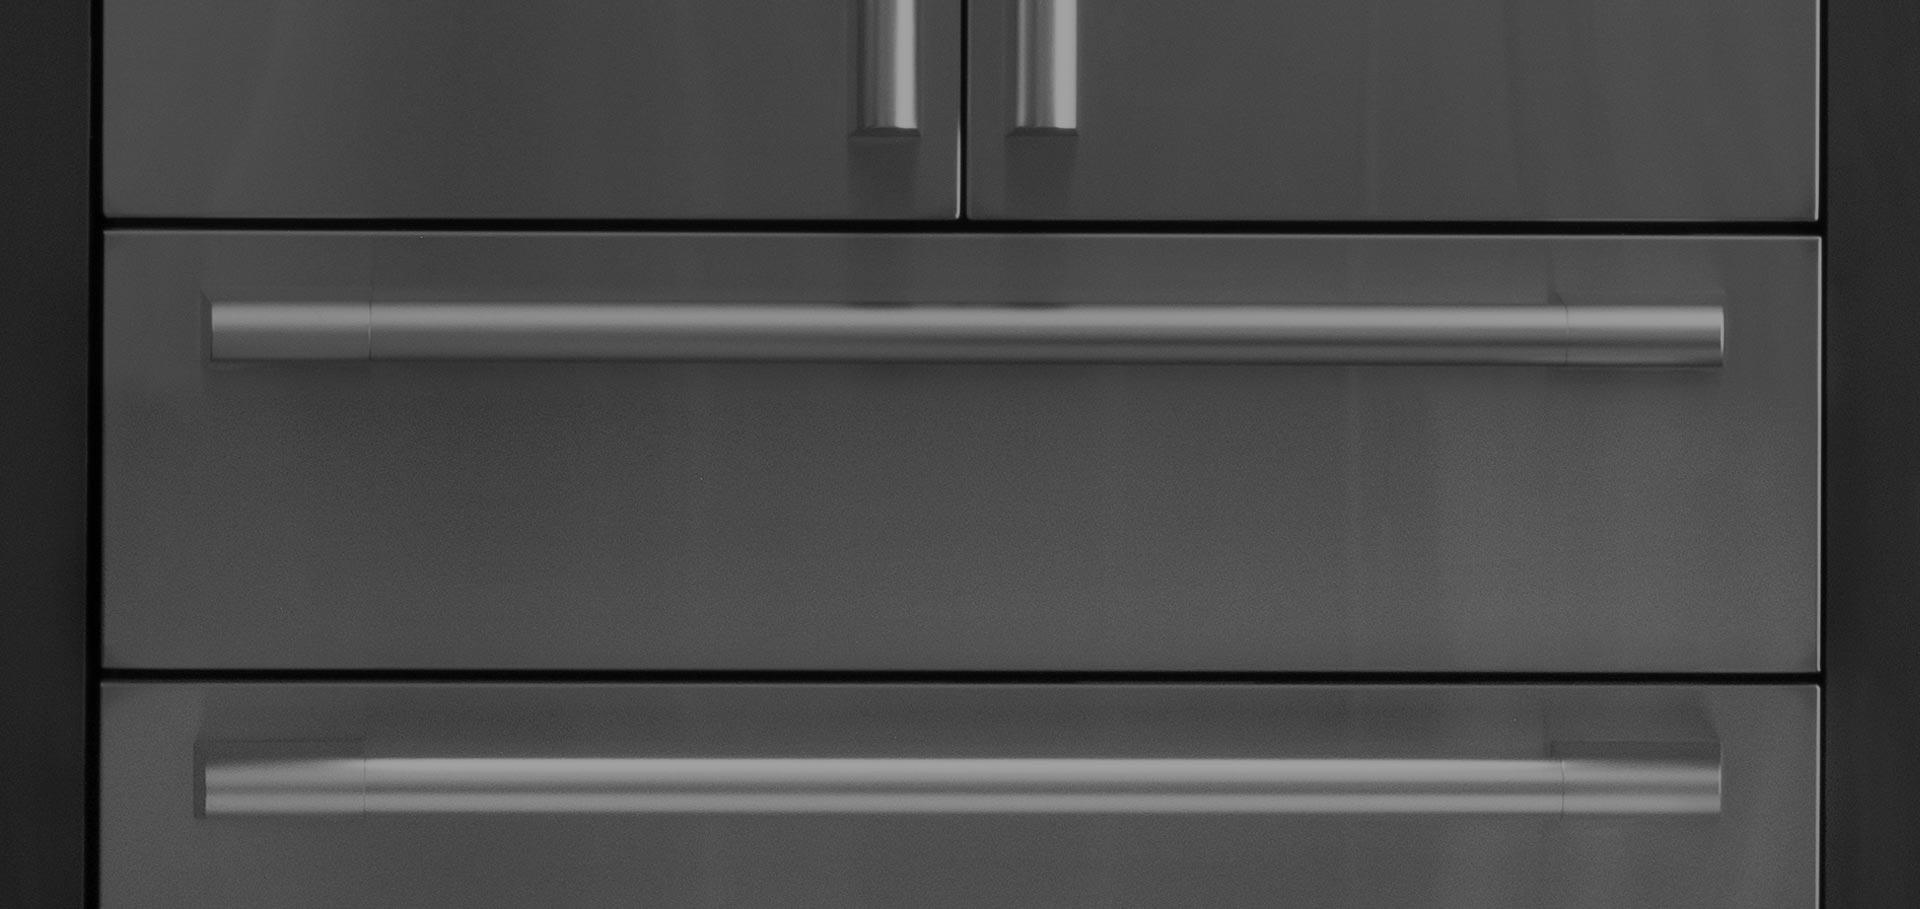 frigorifero da incasso French door